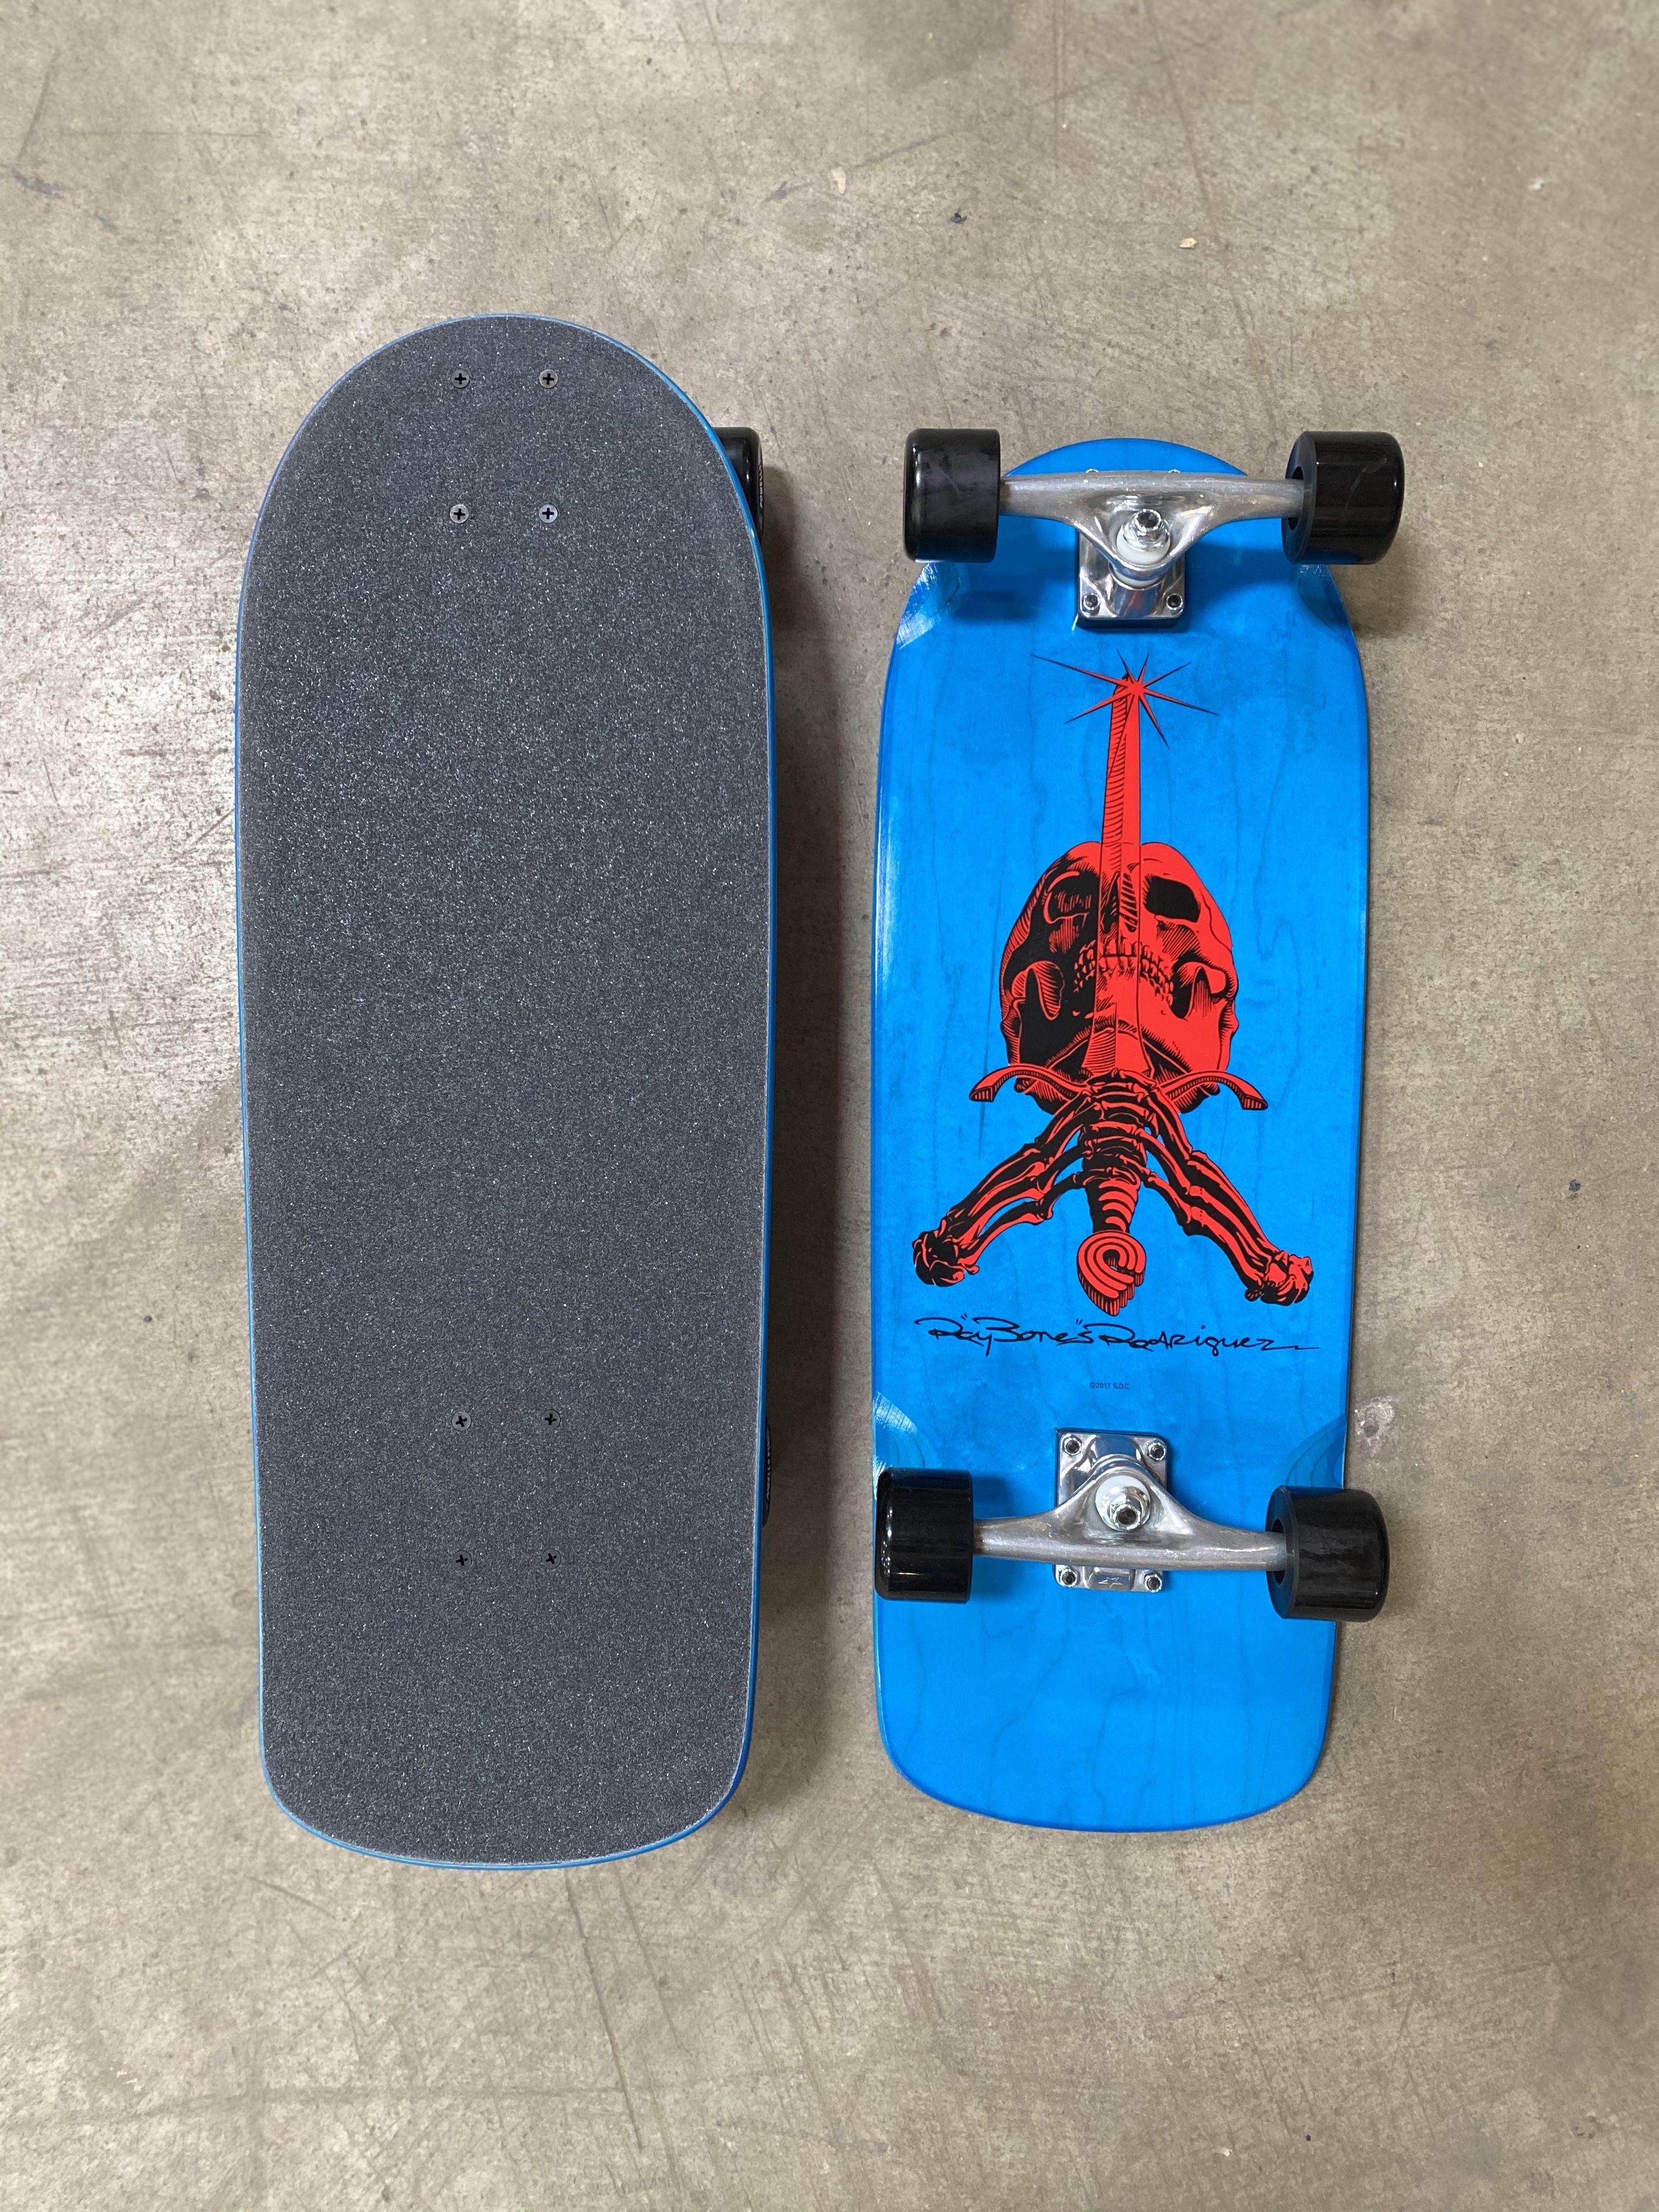 Powell Peralta Og Rodriguez Skull And Sword Skateboard Deck Blue 10 X 28 25 In 2020 Skateboard Powell Peralta Classic Skateboard